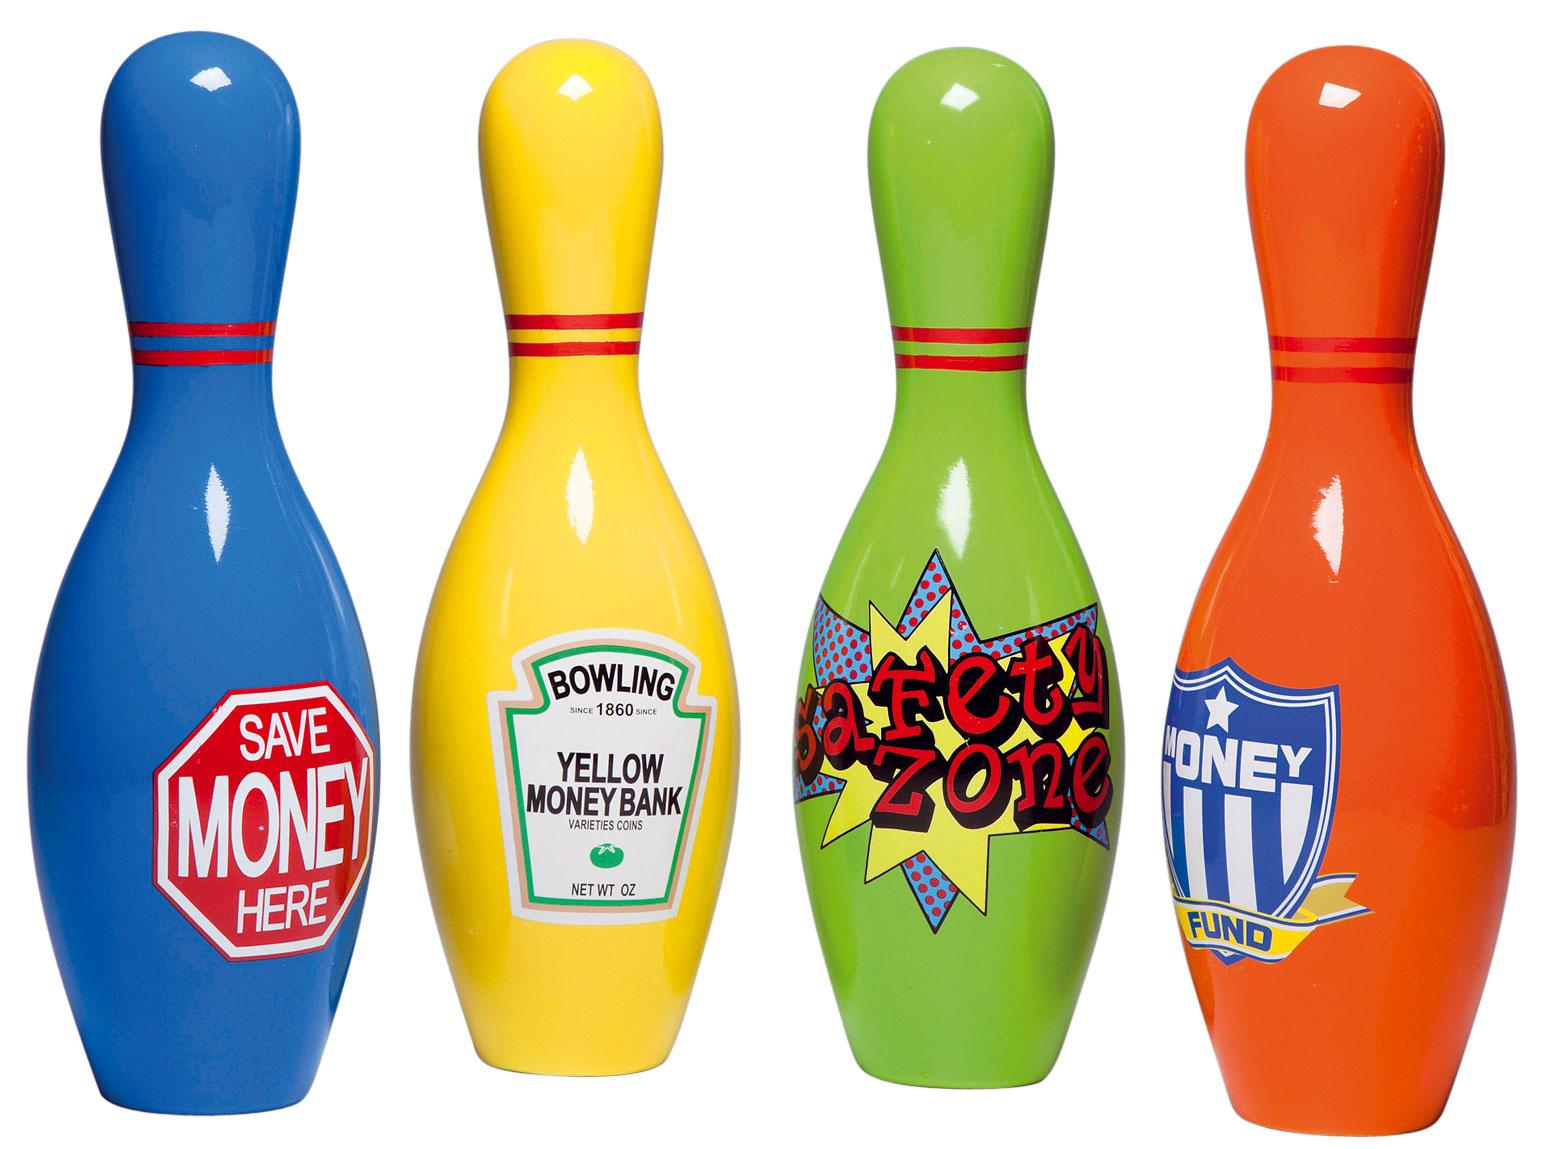 Pokladničky Bowling, dolomit, PE, 30 × 9,5 × 9,5 cm, 19,90 €, Kare, Light Park